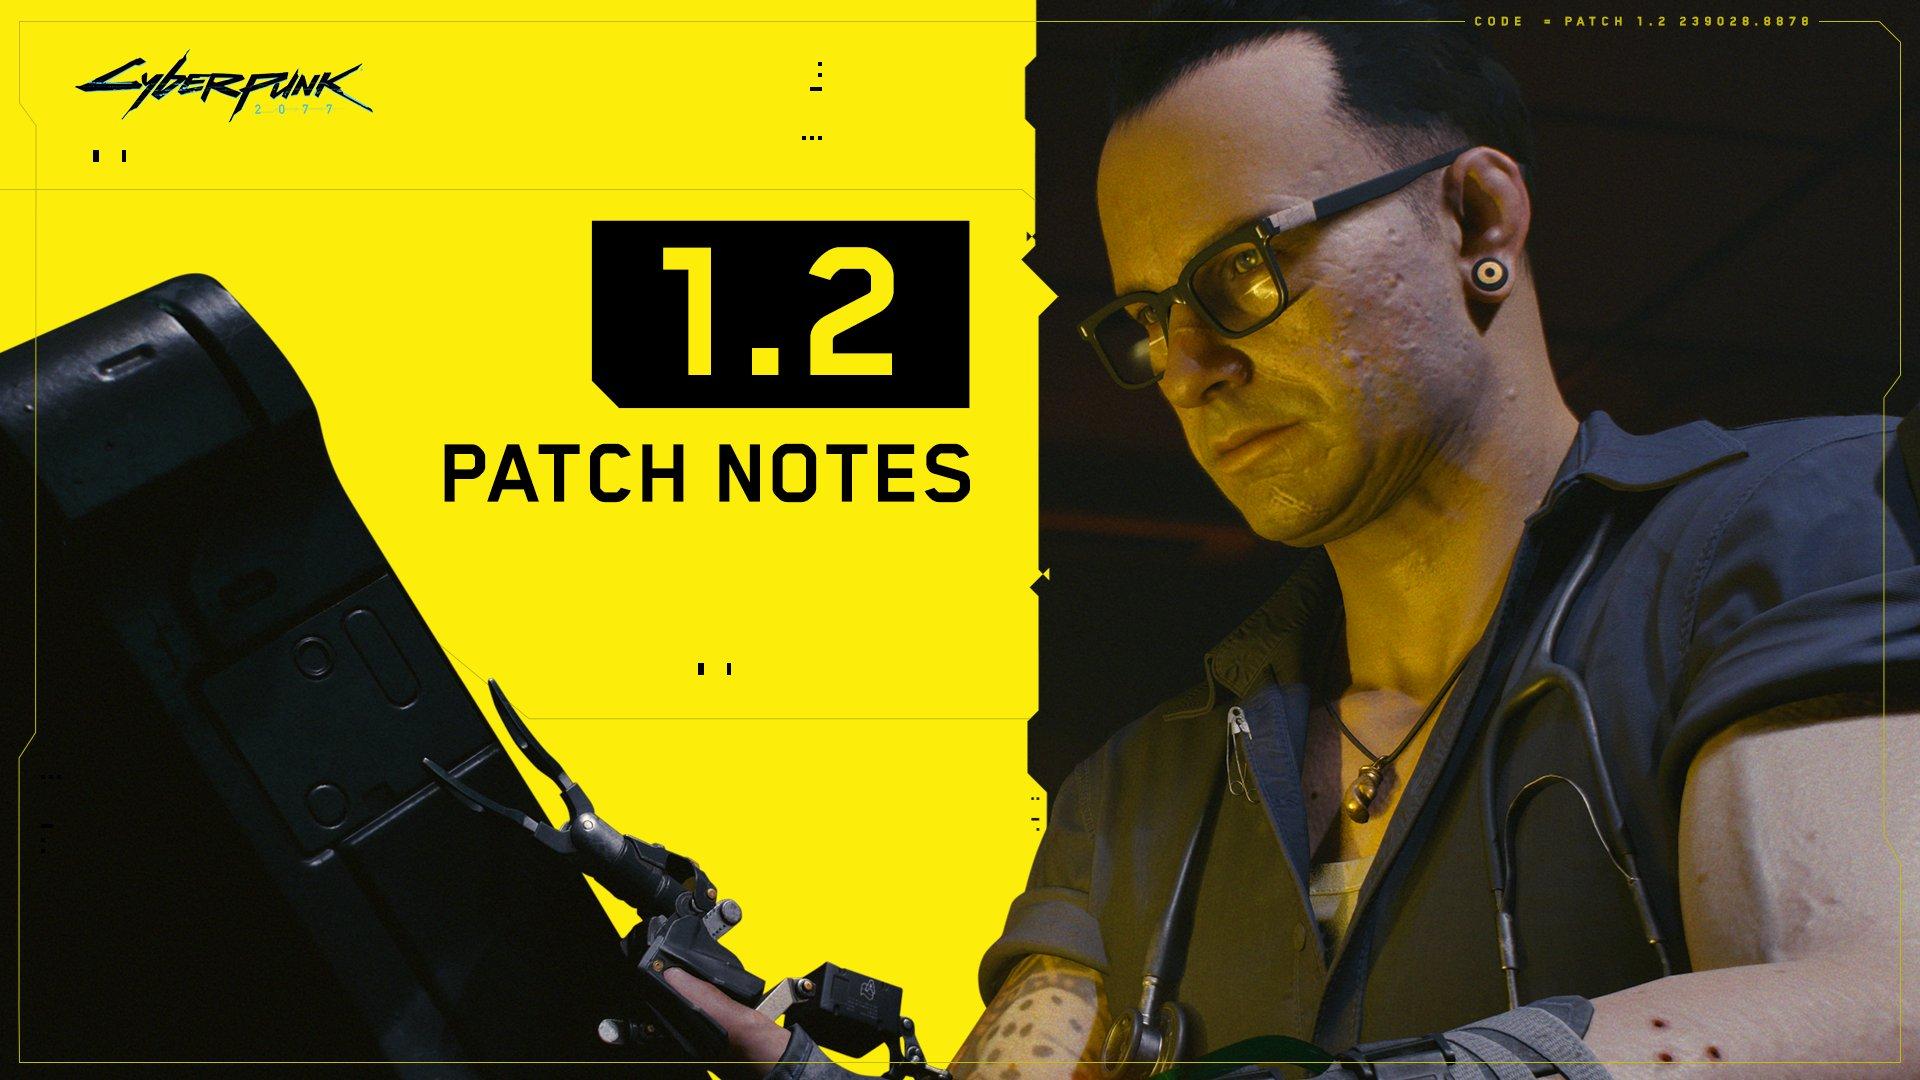 Cyberpunk 2077 releases Patch 1.2 changelog, update is 'coming soon' – VideoCardz.com